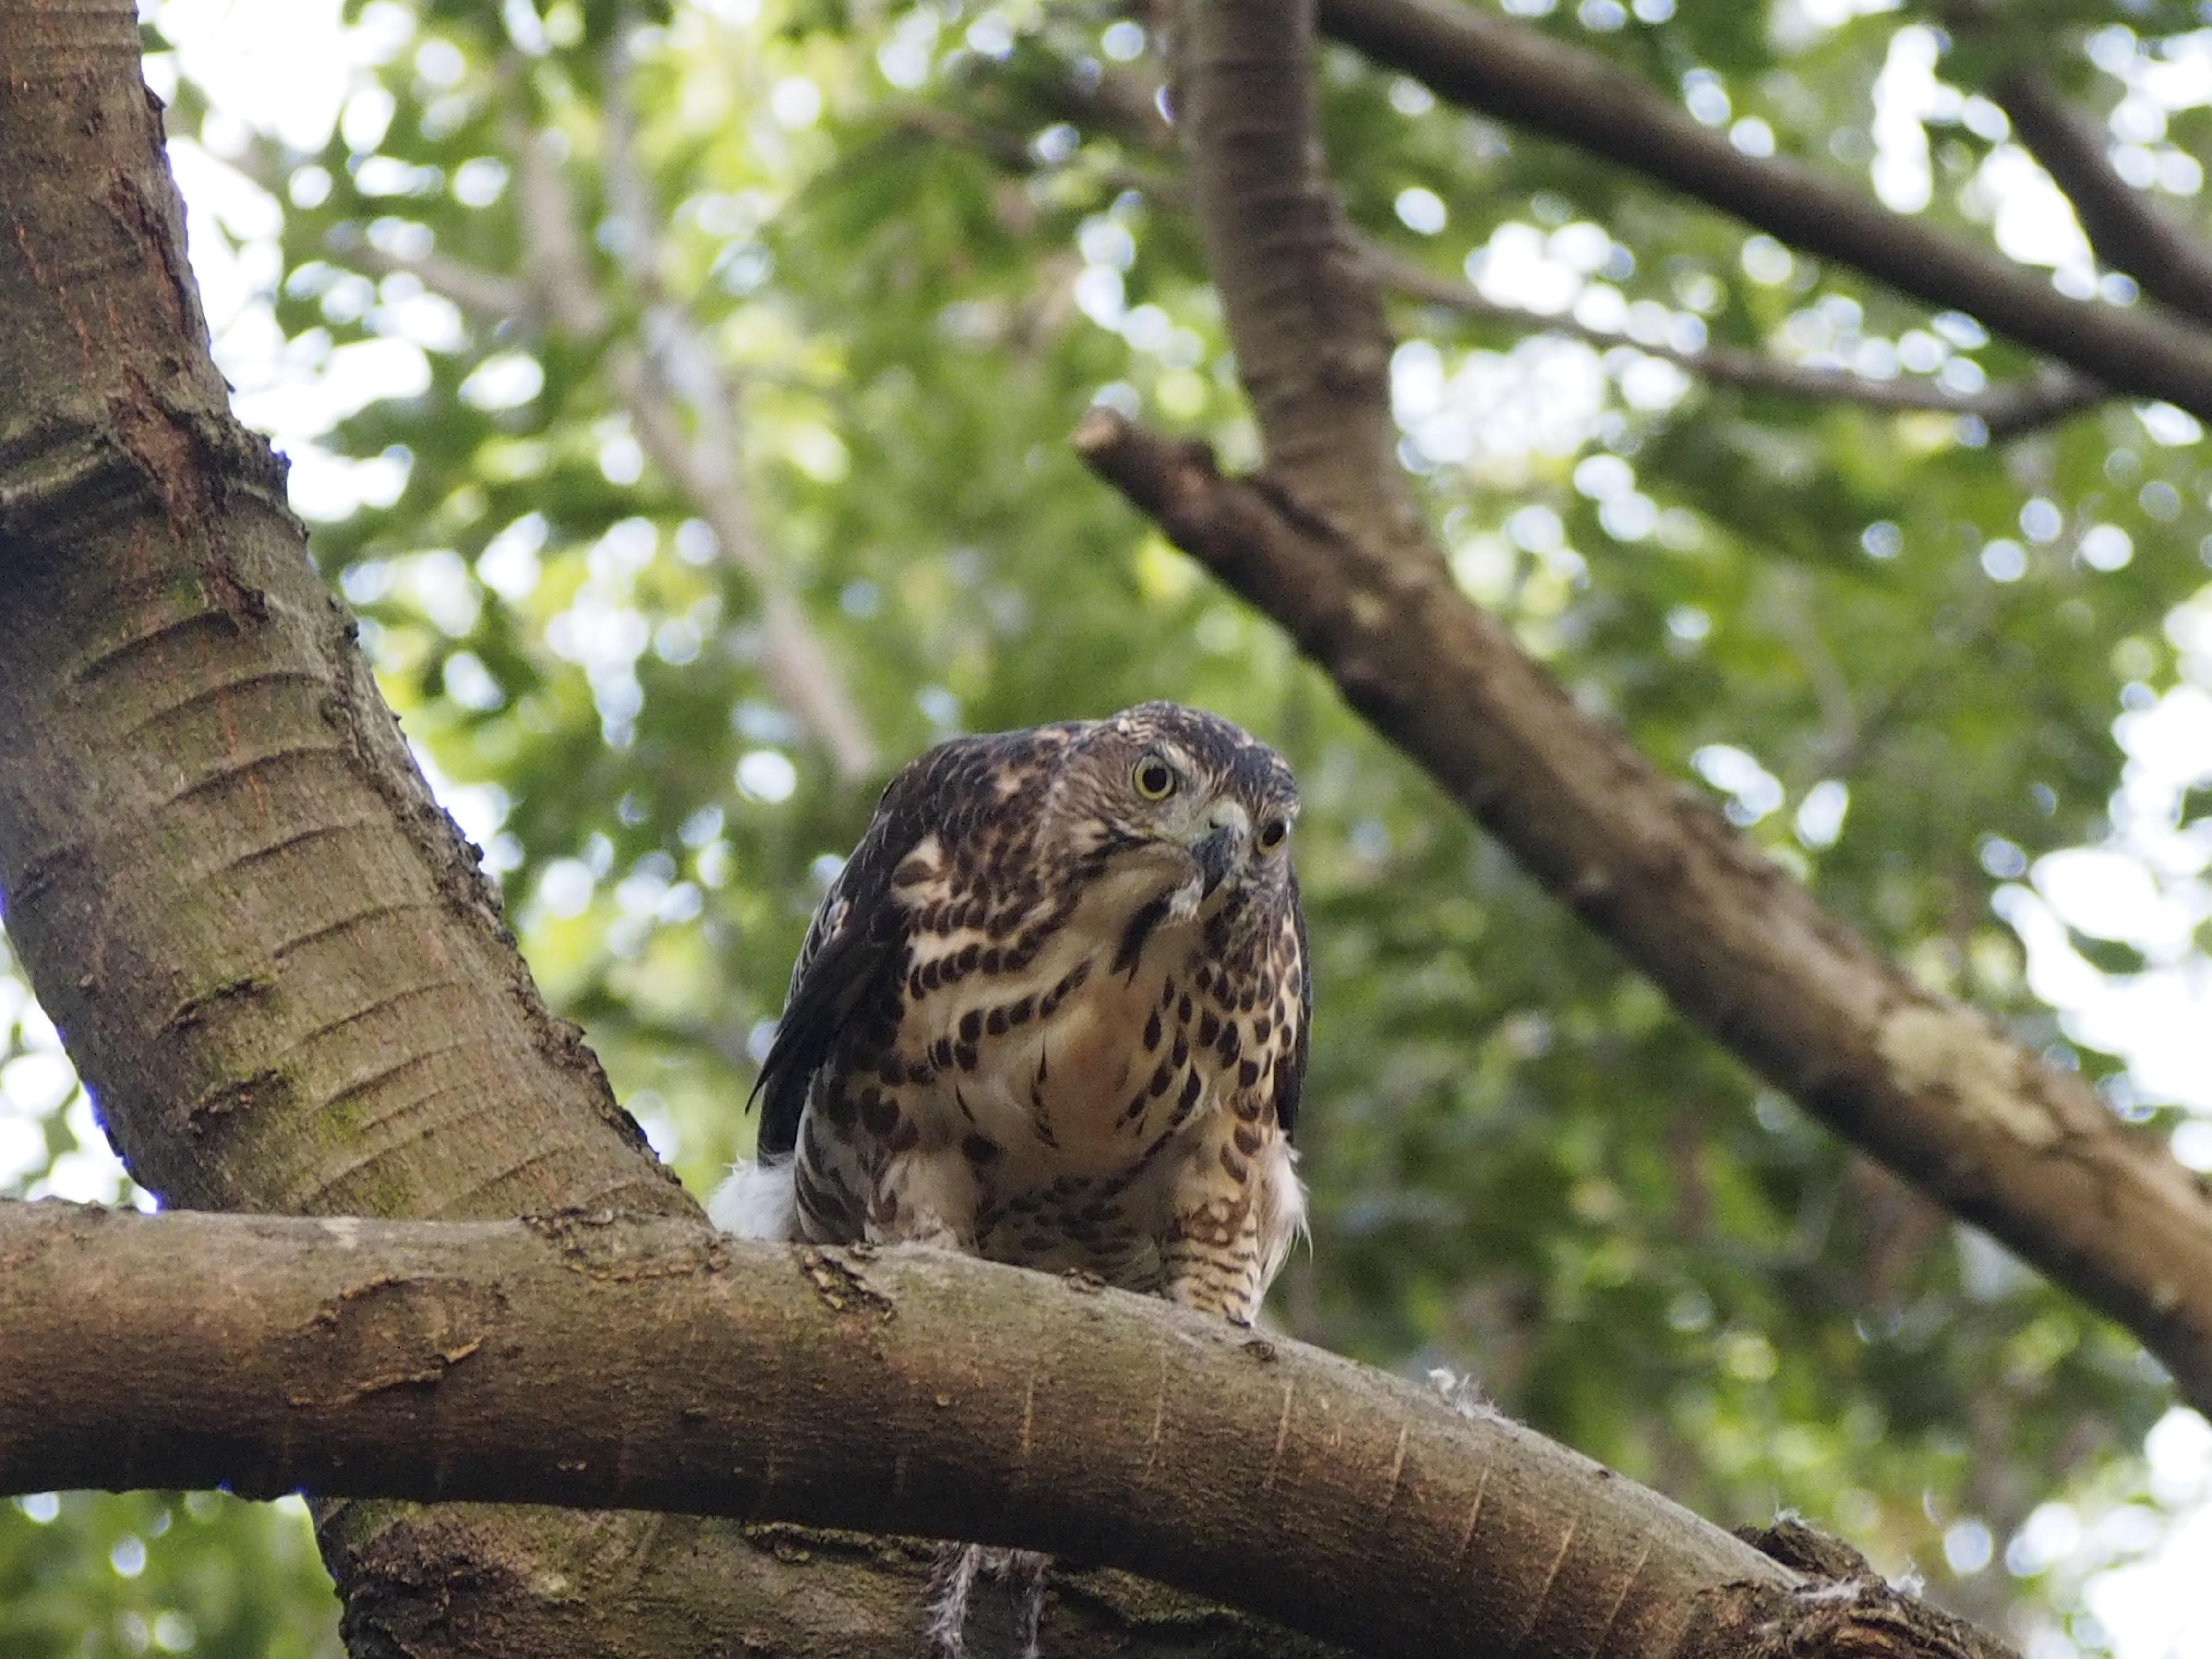 Unduh 700+  Gambar Burung Hantu Makan Elang HD Terbaru